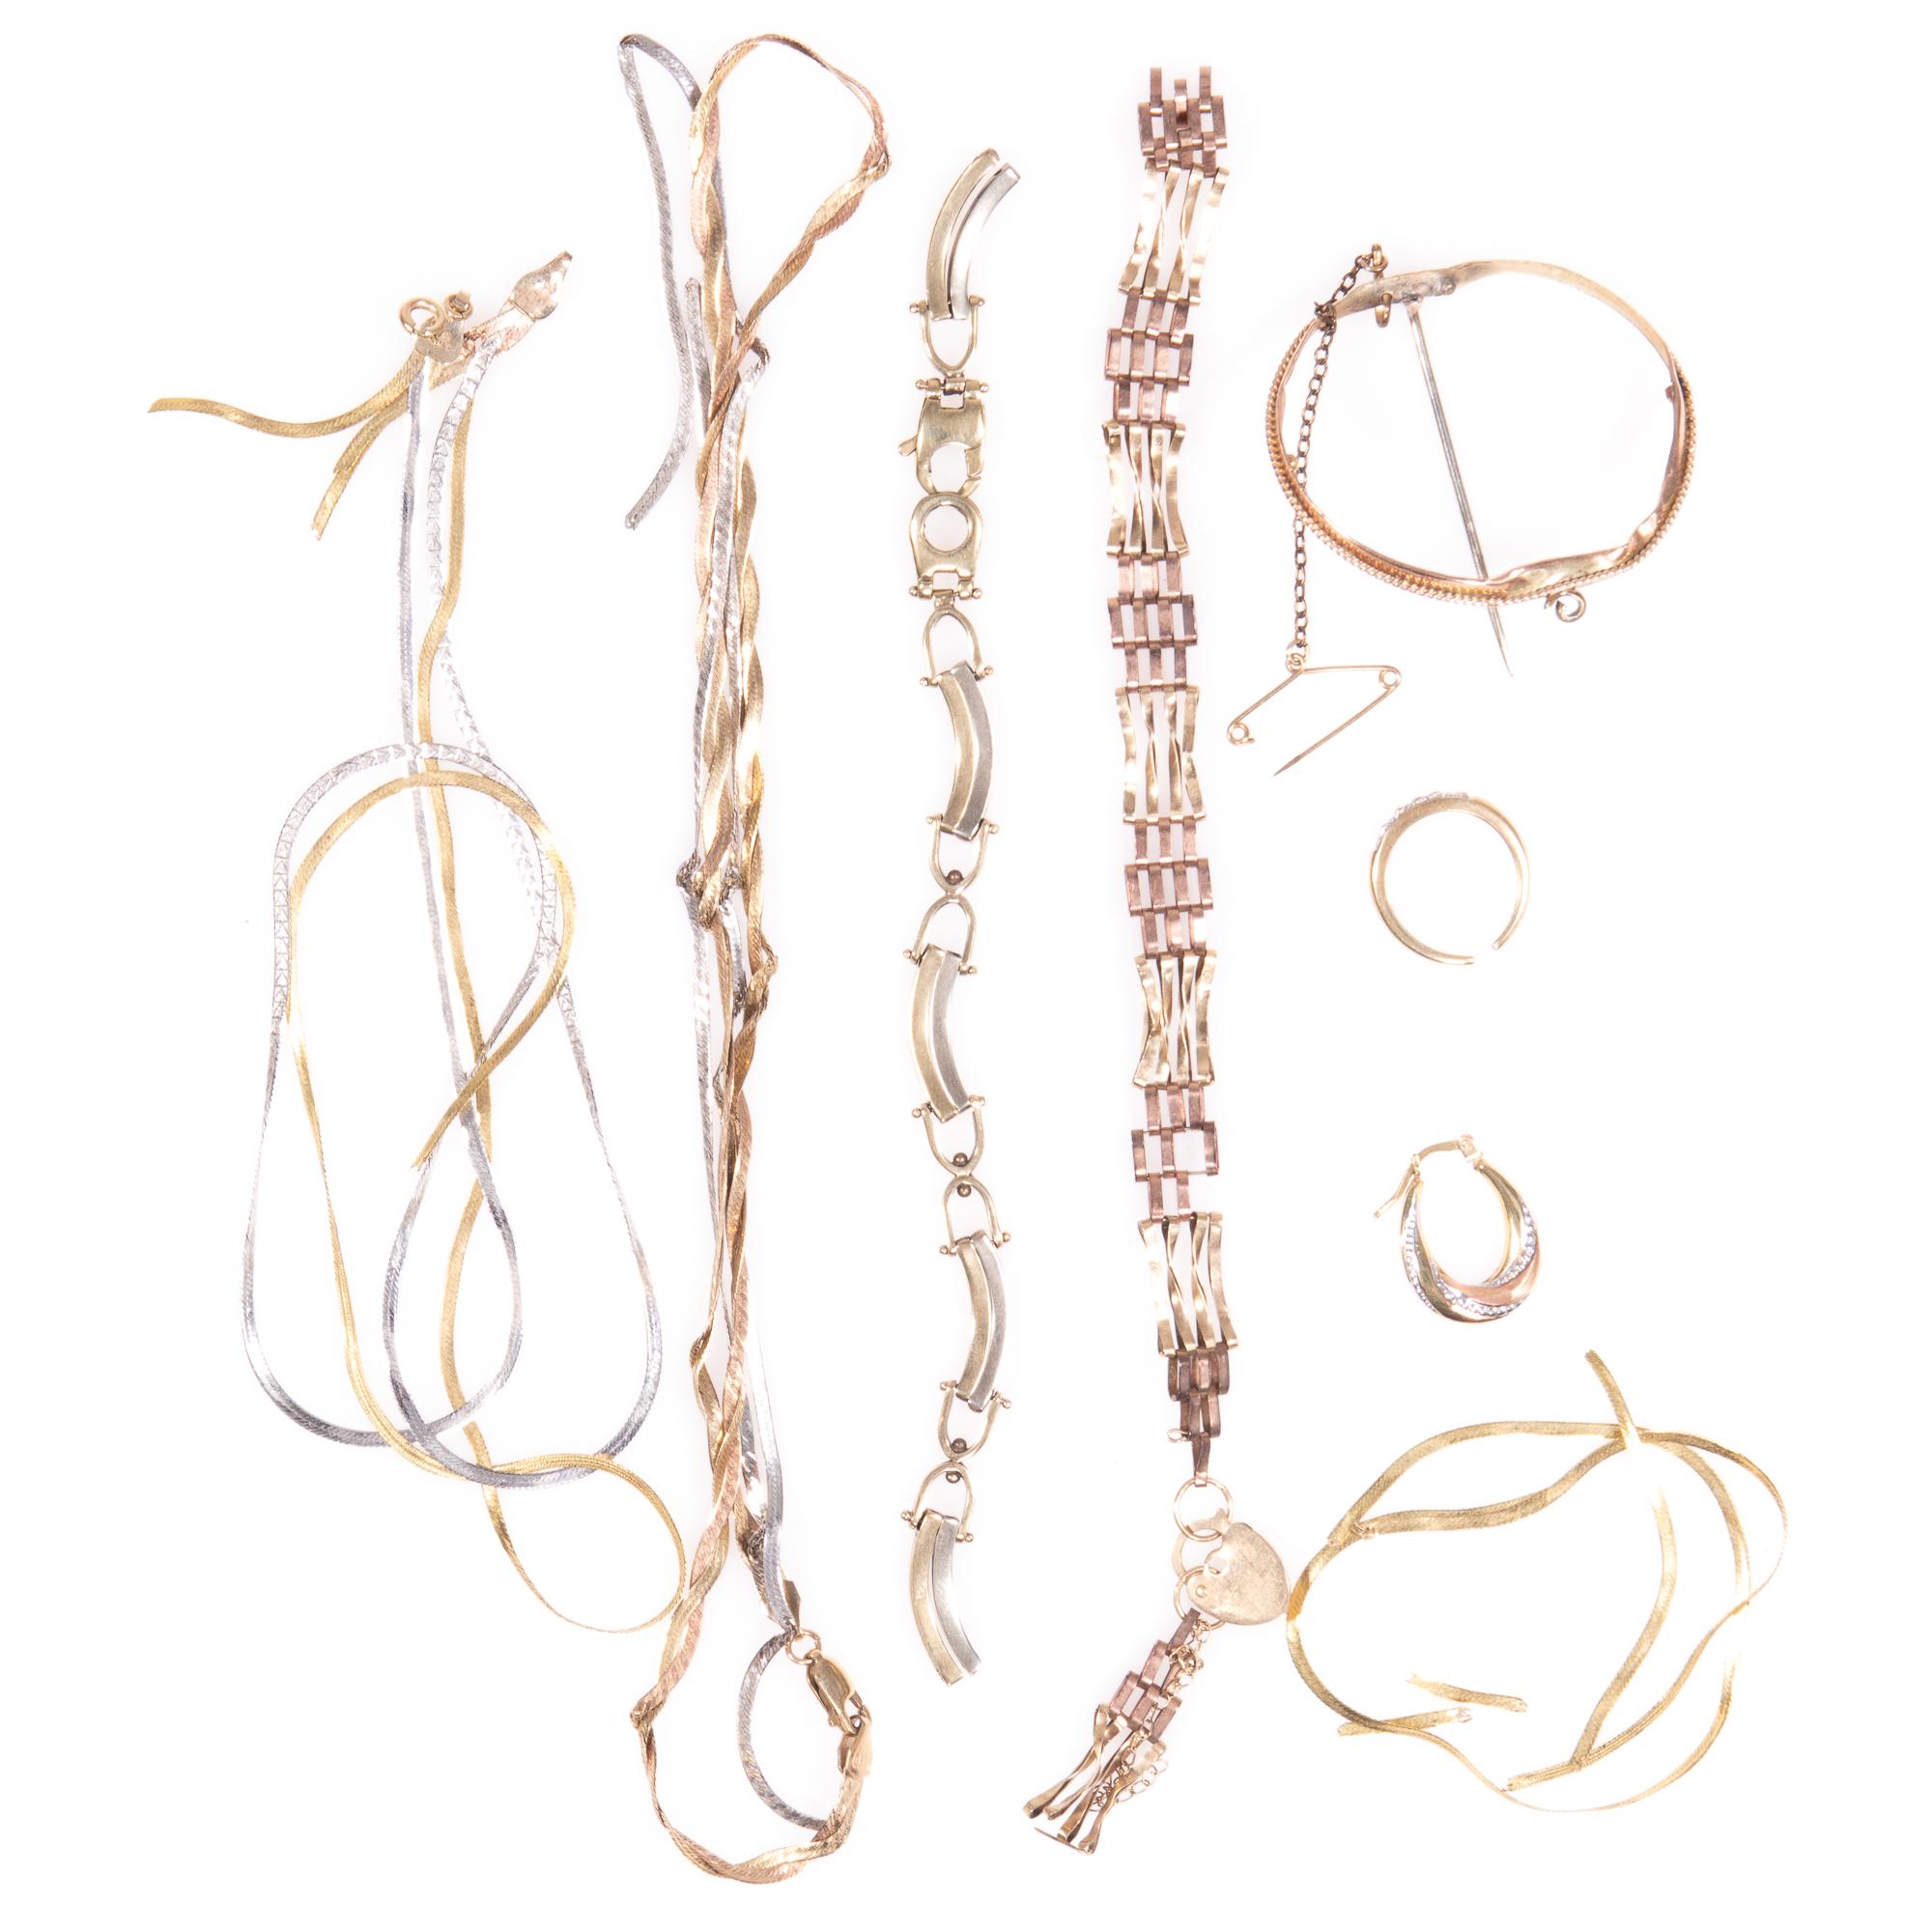 26 grams Scrap Gold Jewellery